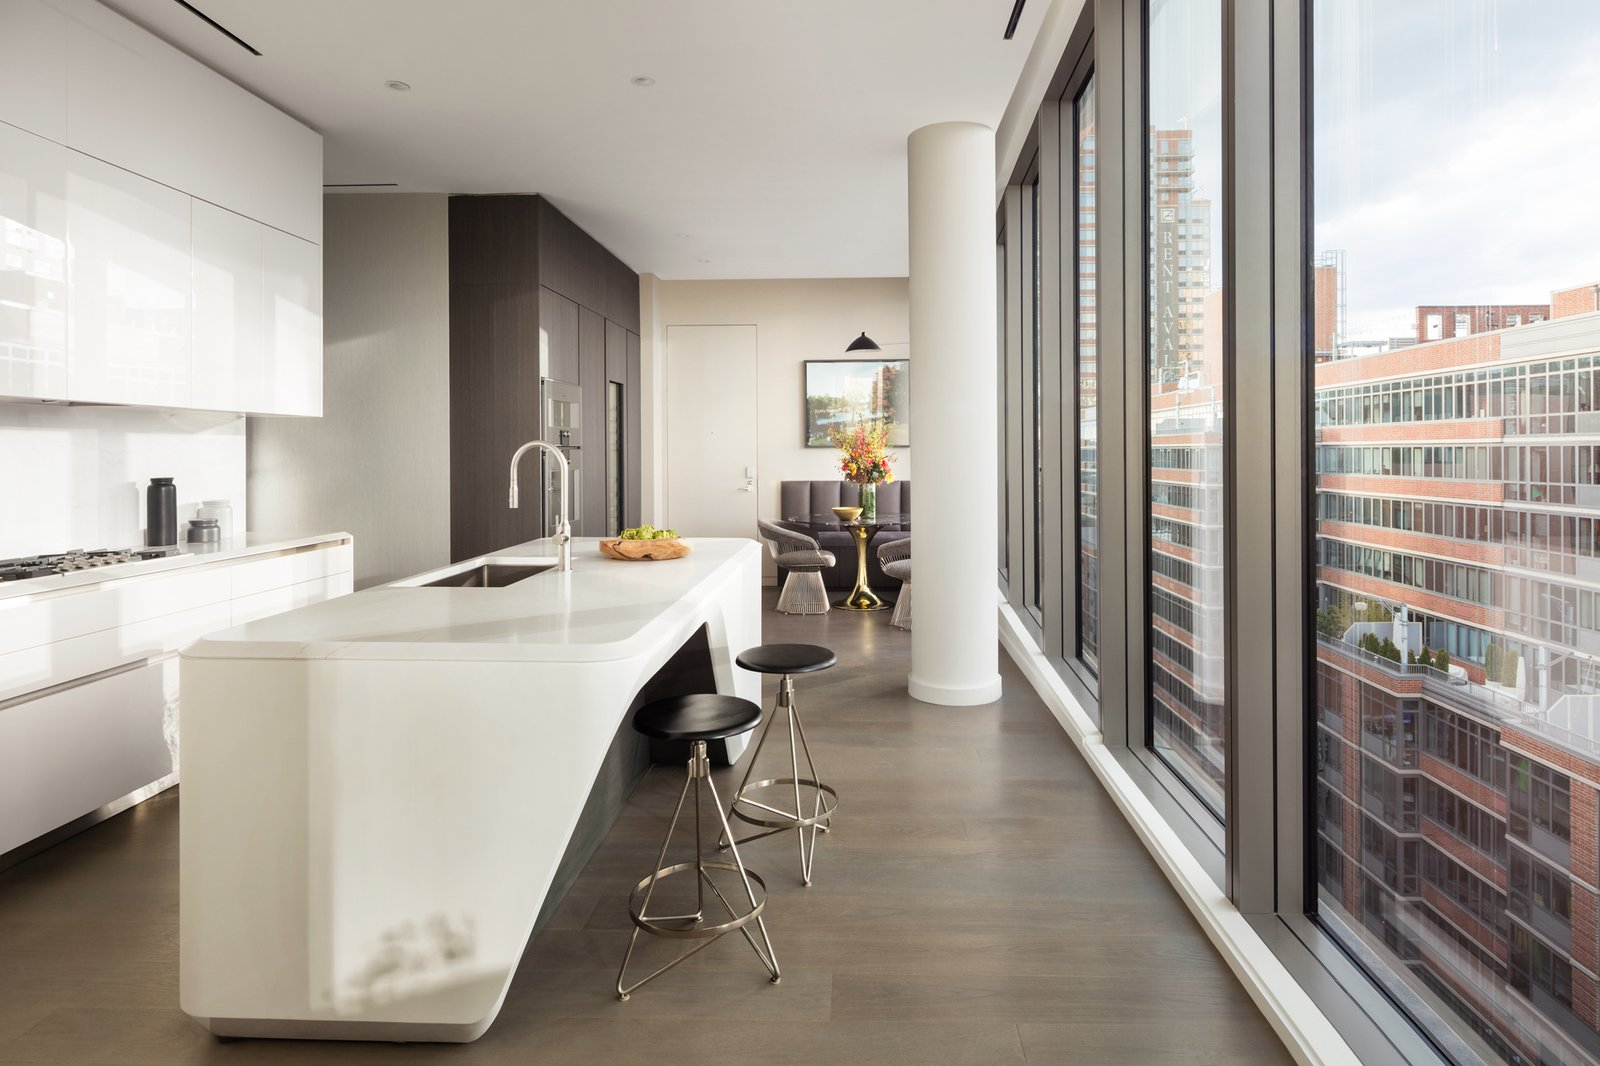 Zaha Hadid New York Penthouse kitchen